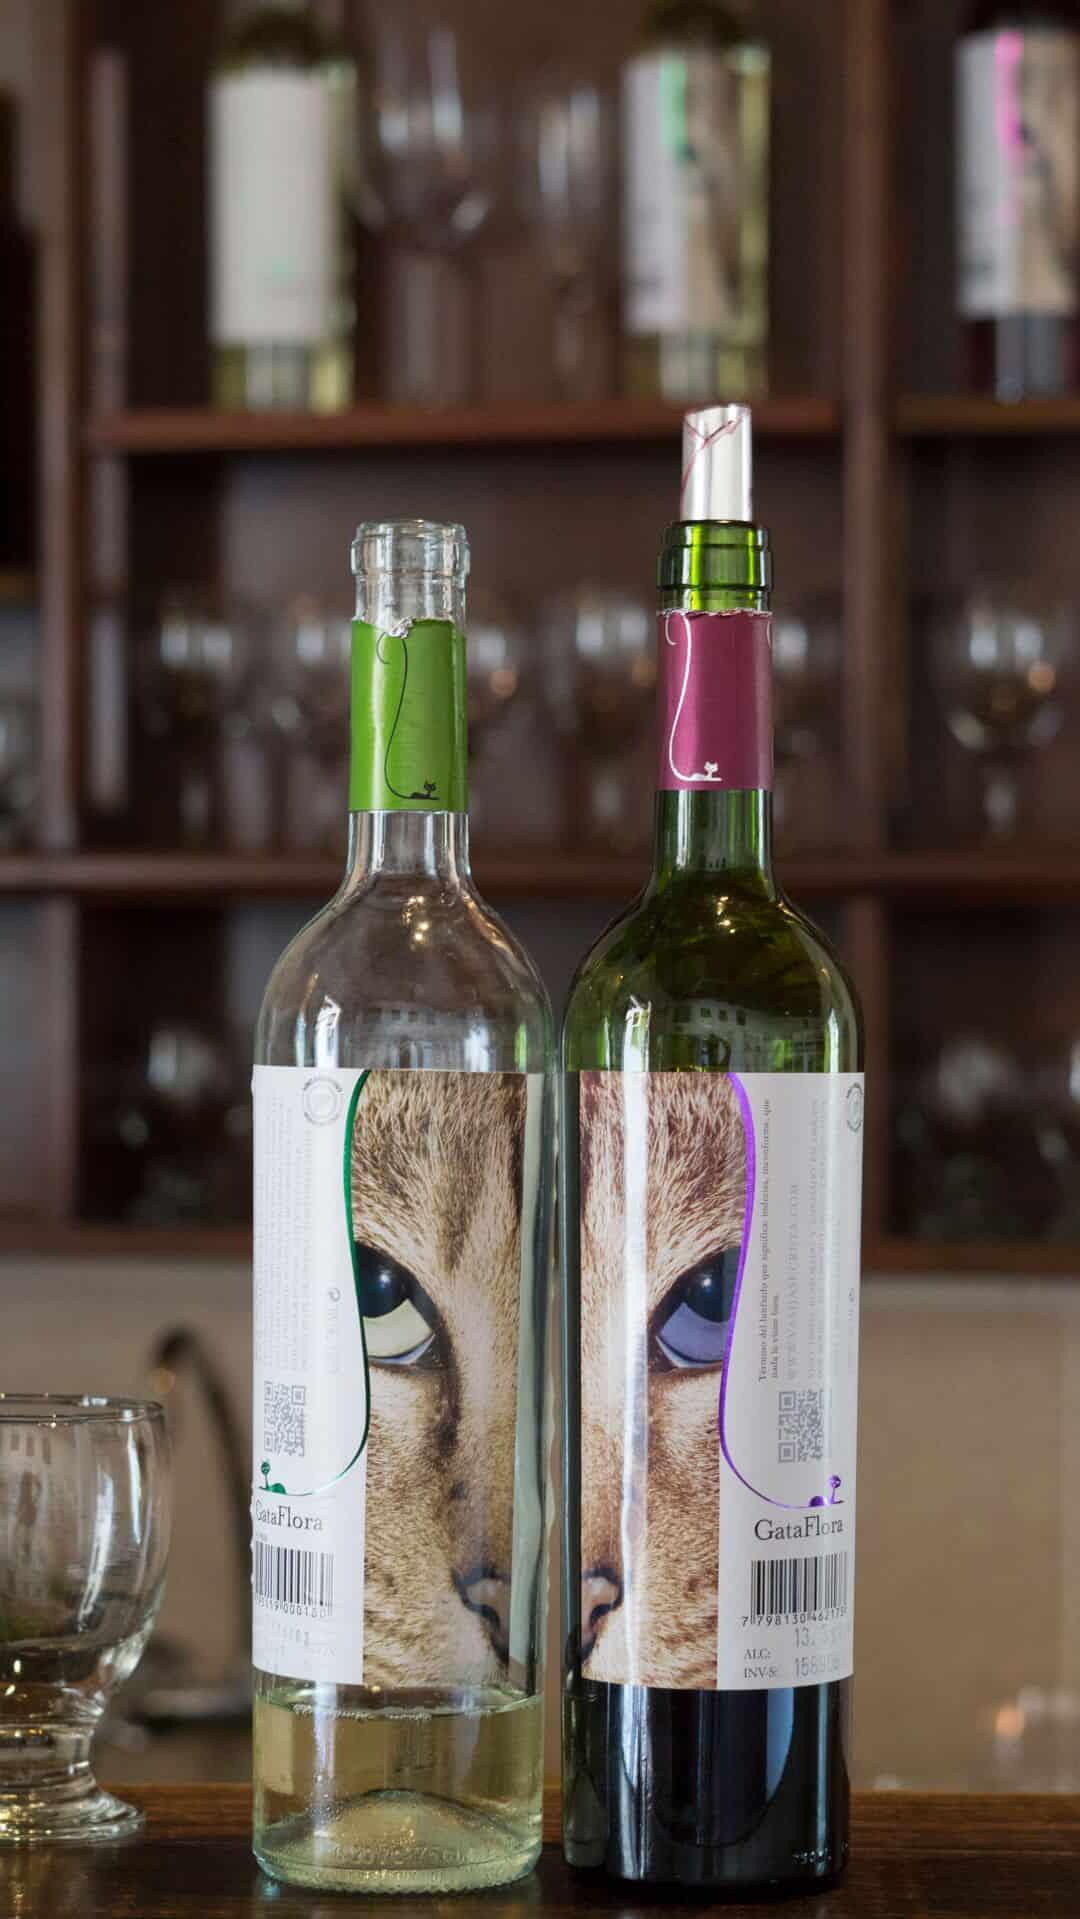 wine bottles from Salta, Argentina